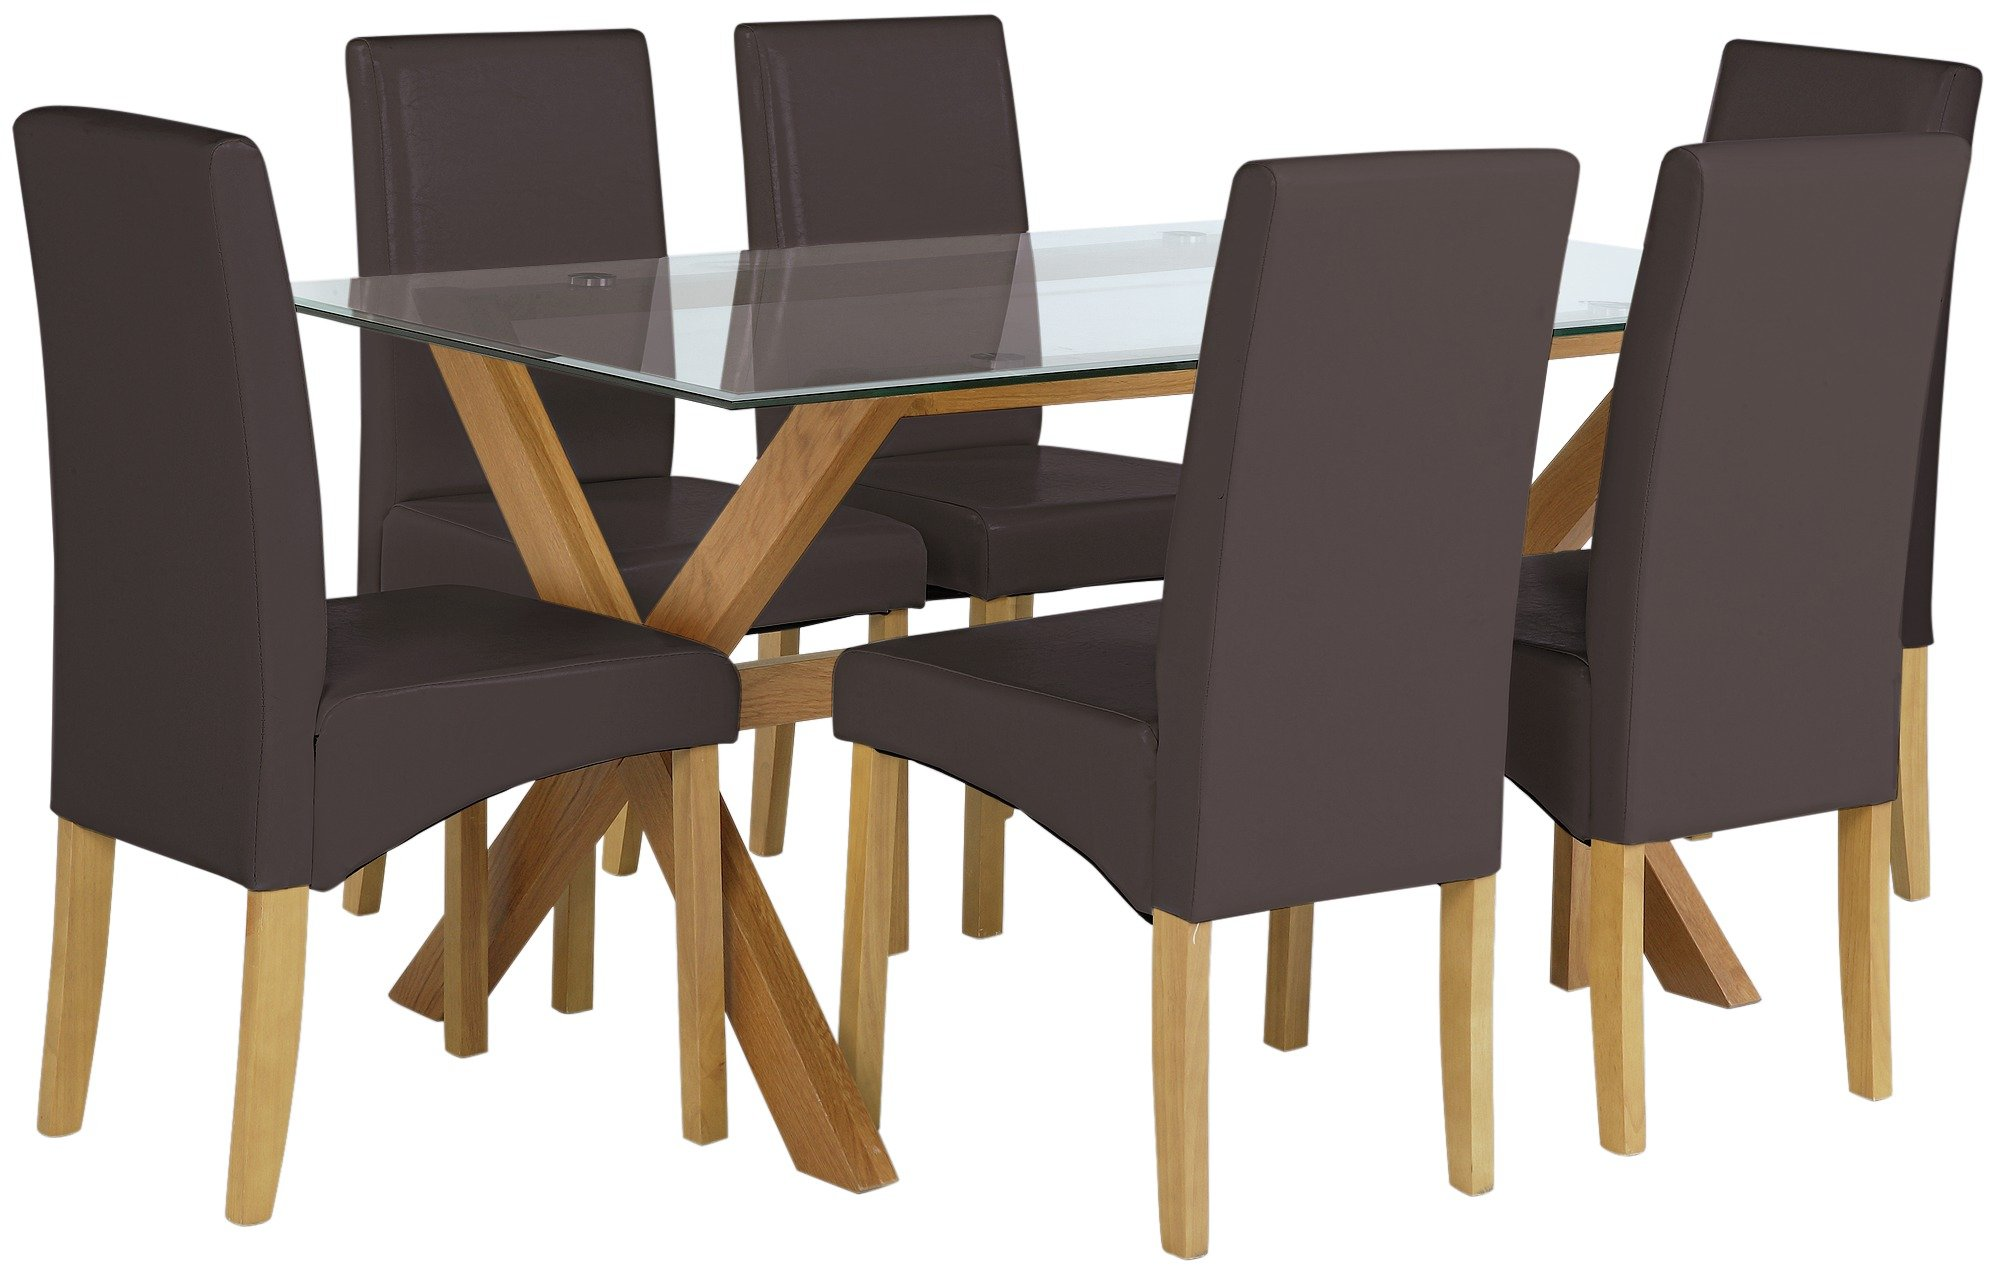 Heart of House Oakington Rec Glass Table & 6 Chairs - Choc